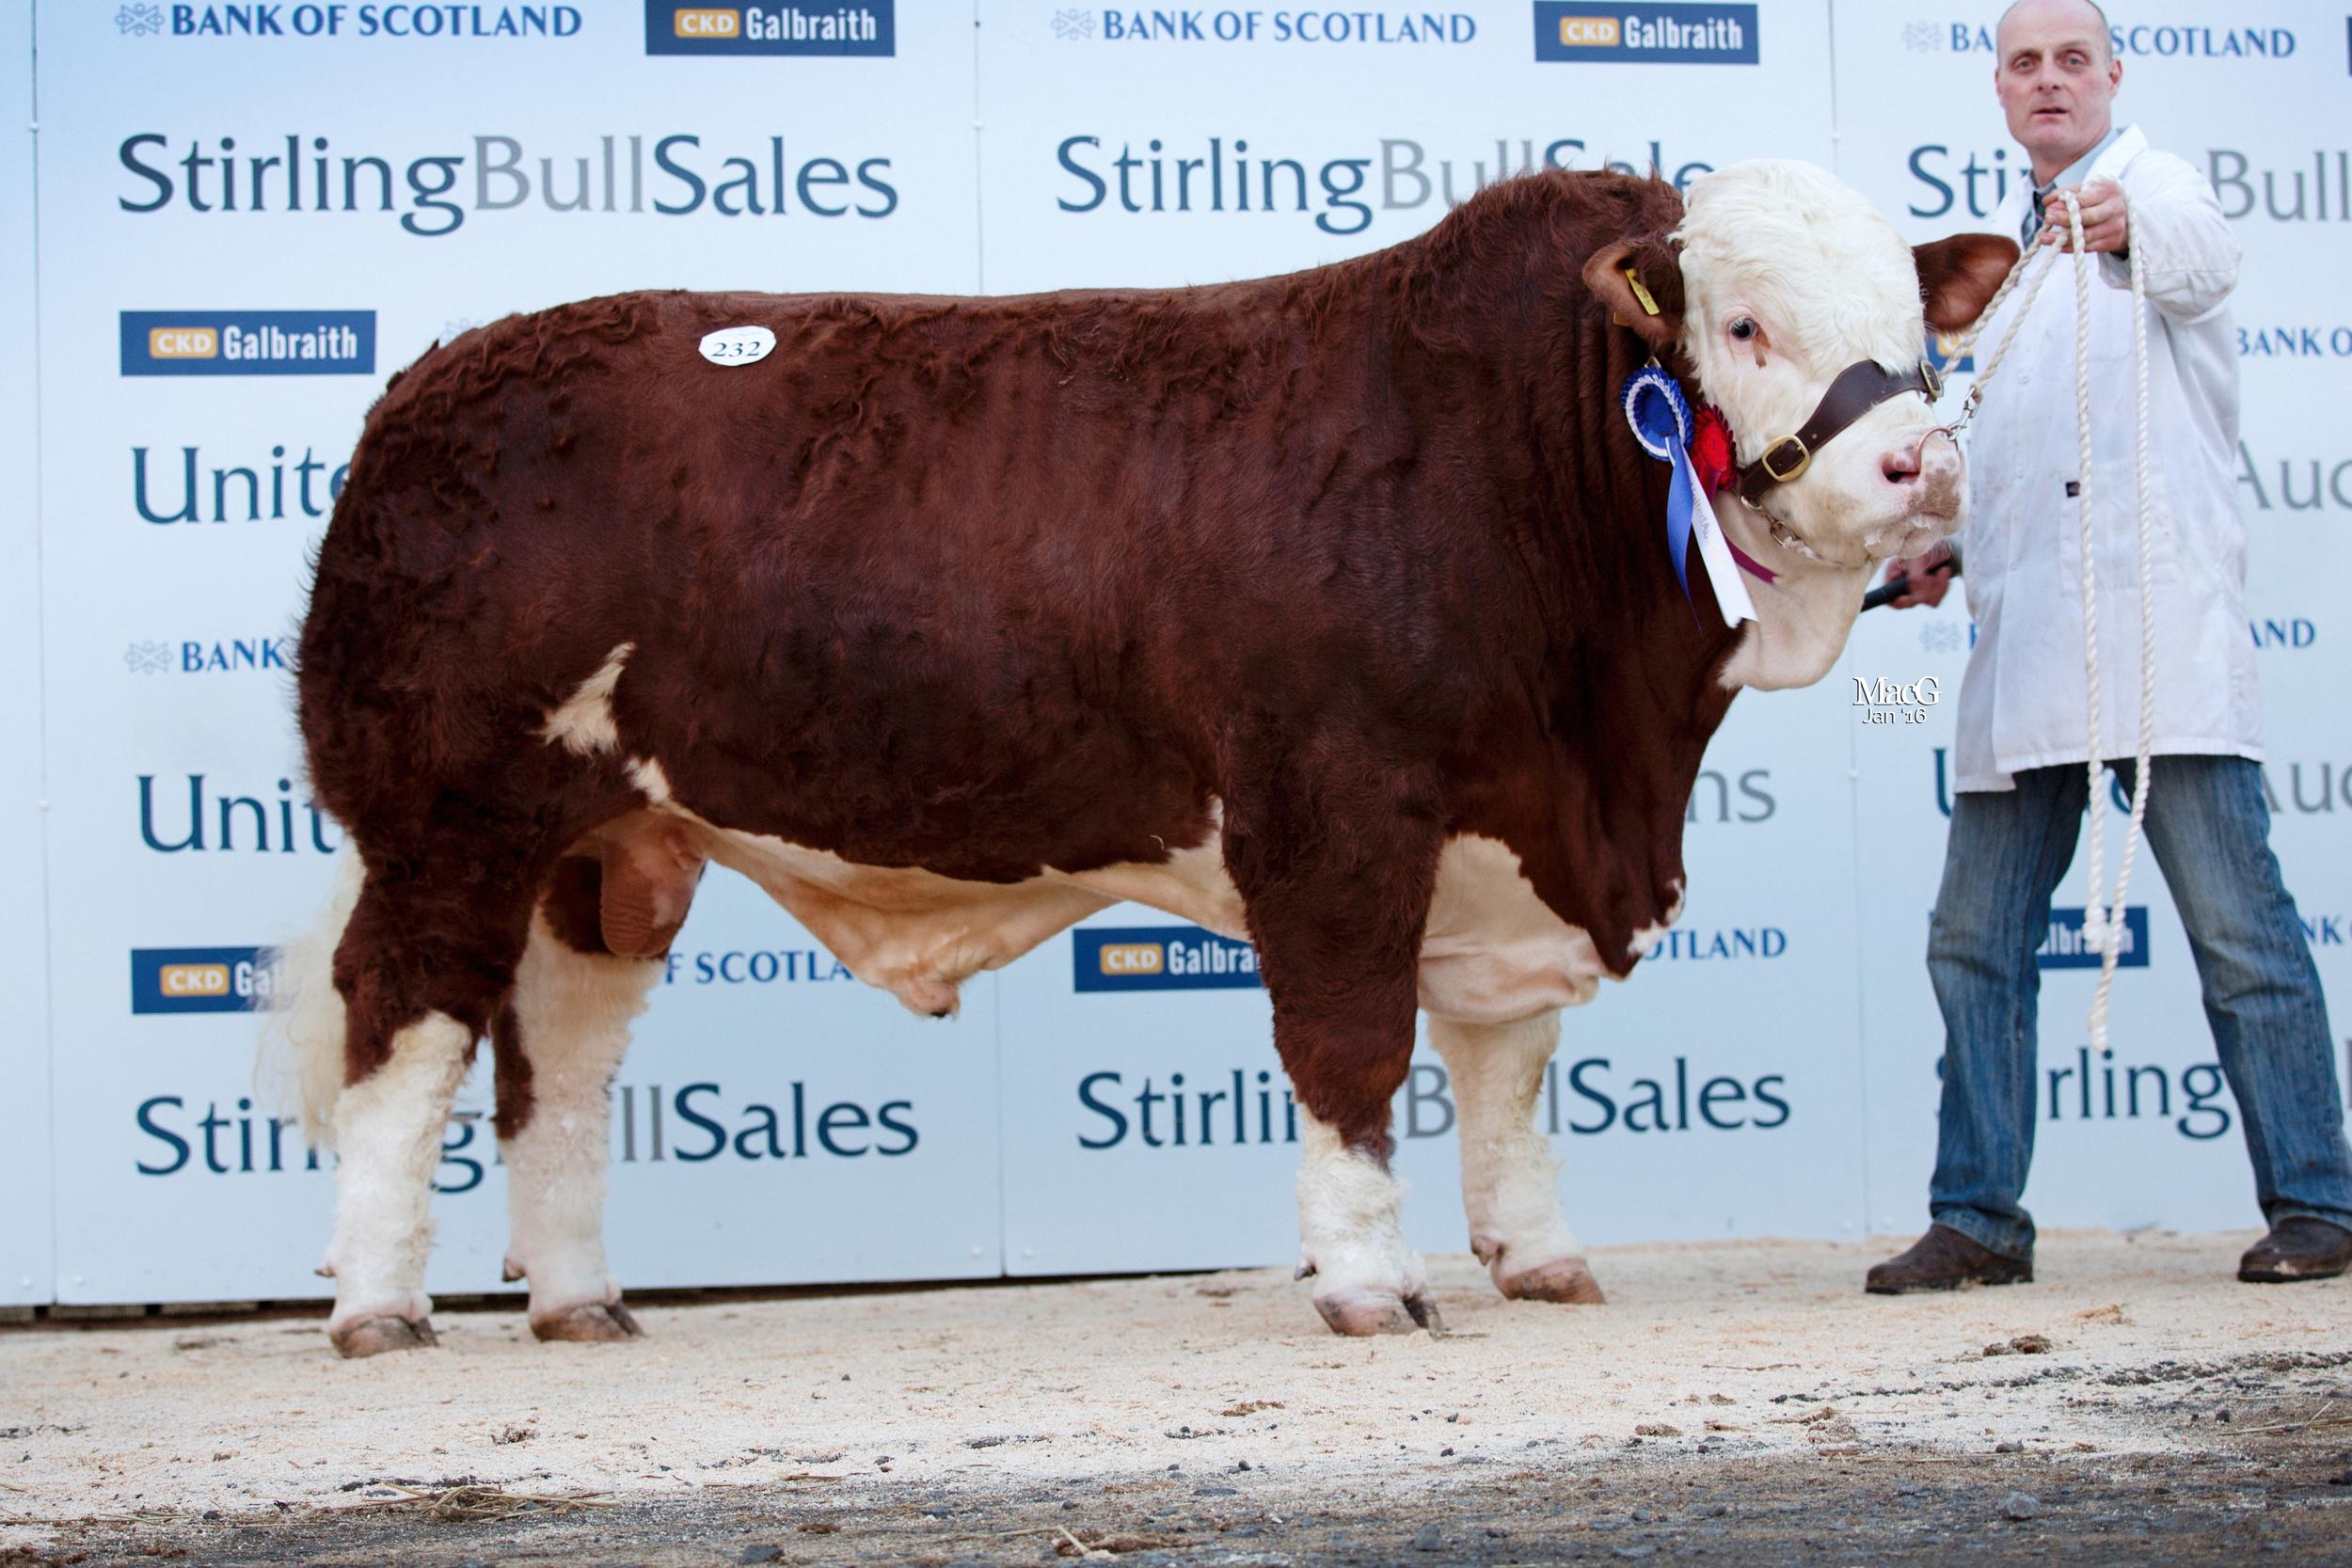 232-Kilbride-Farm-Fearless-15,000gns-4839.jpg